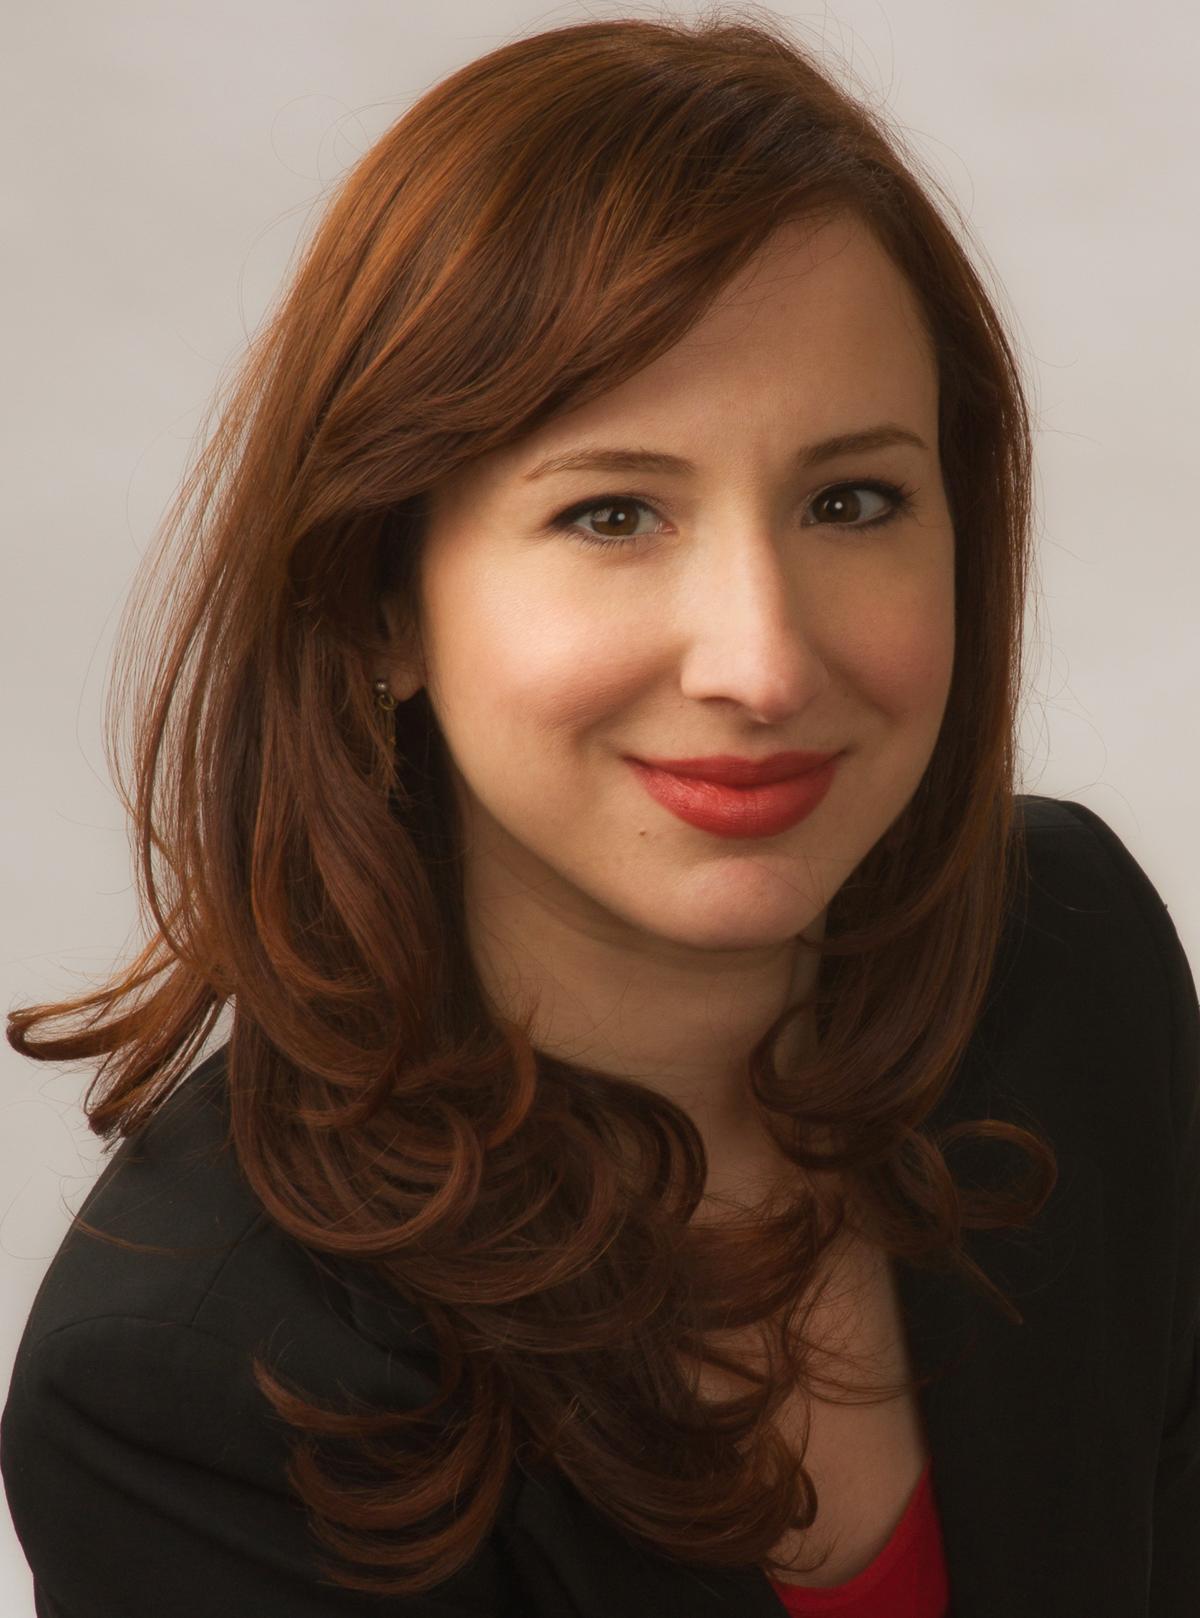 Samantha Eberhardt